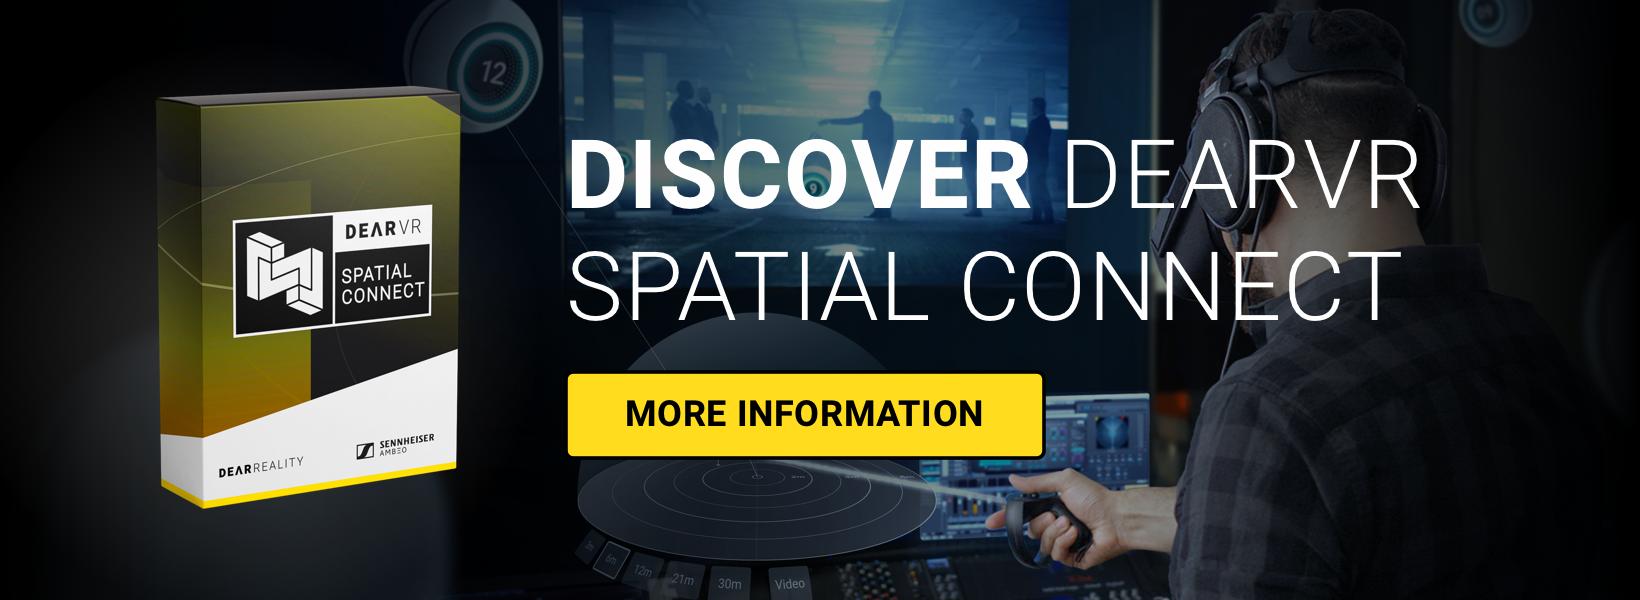 Discover dearVR SPATIAL CONNECT